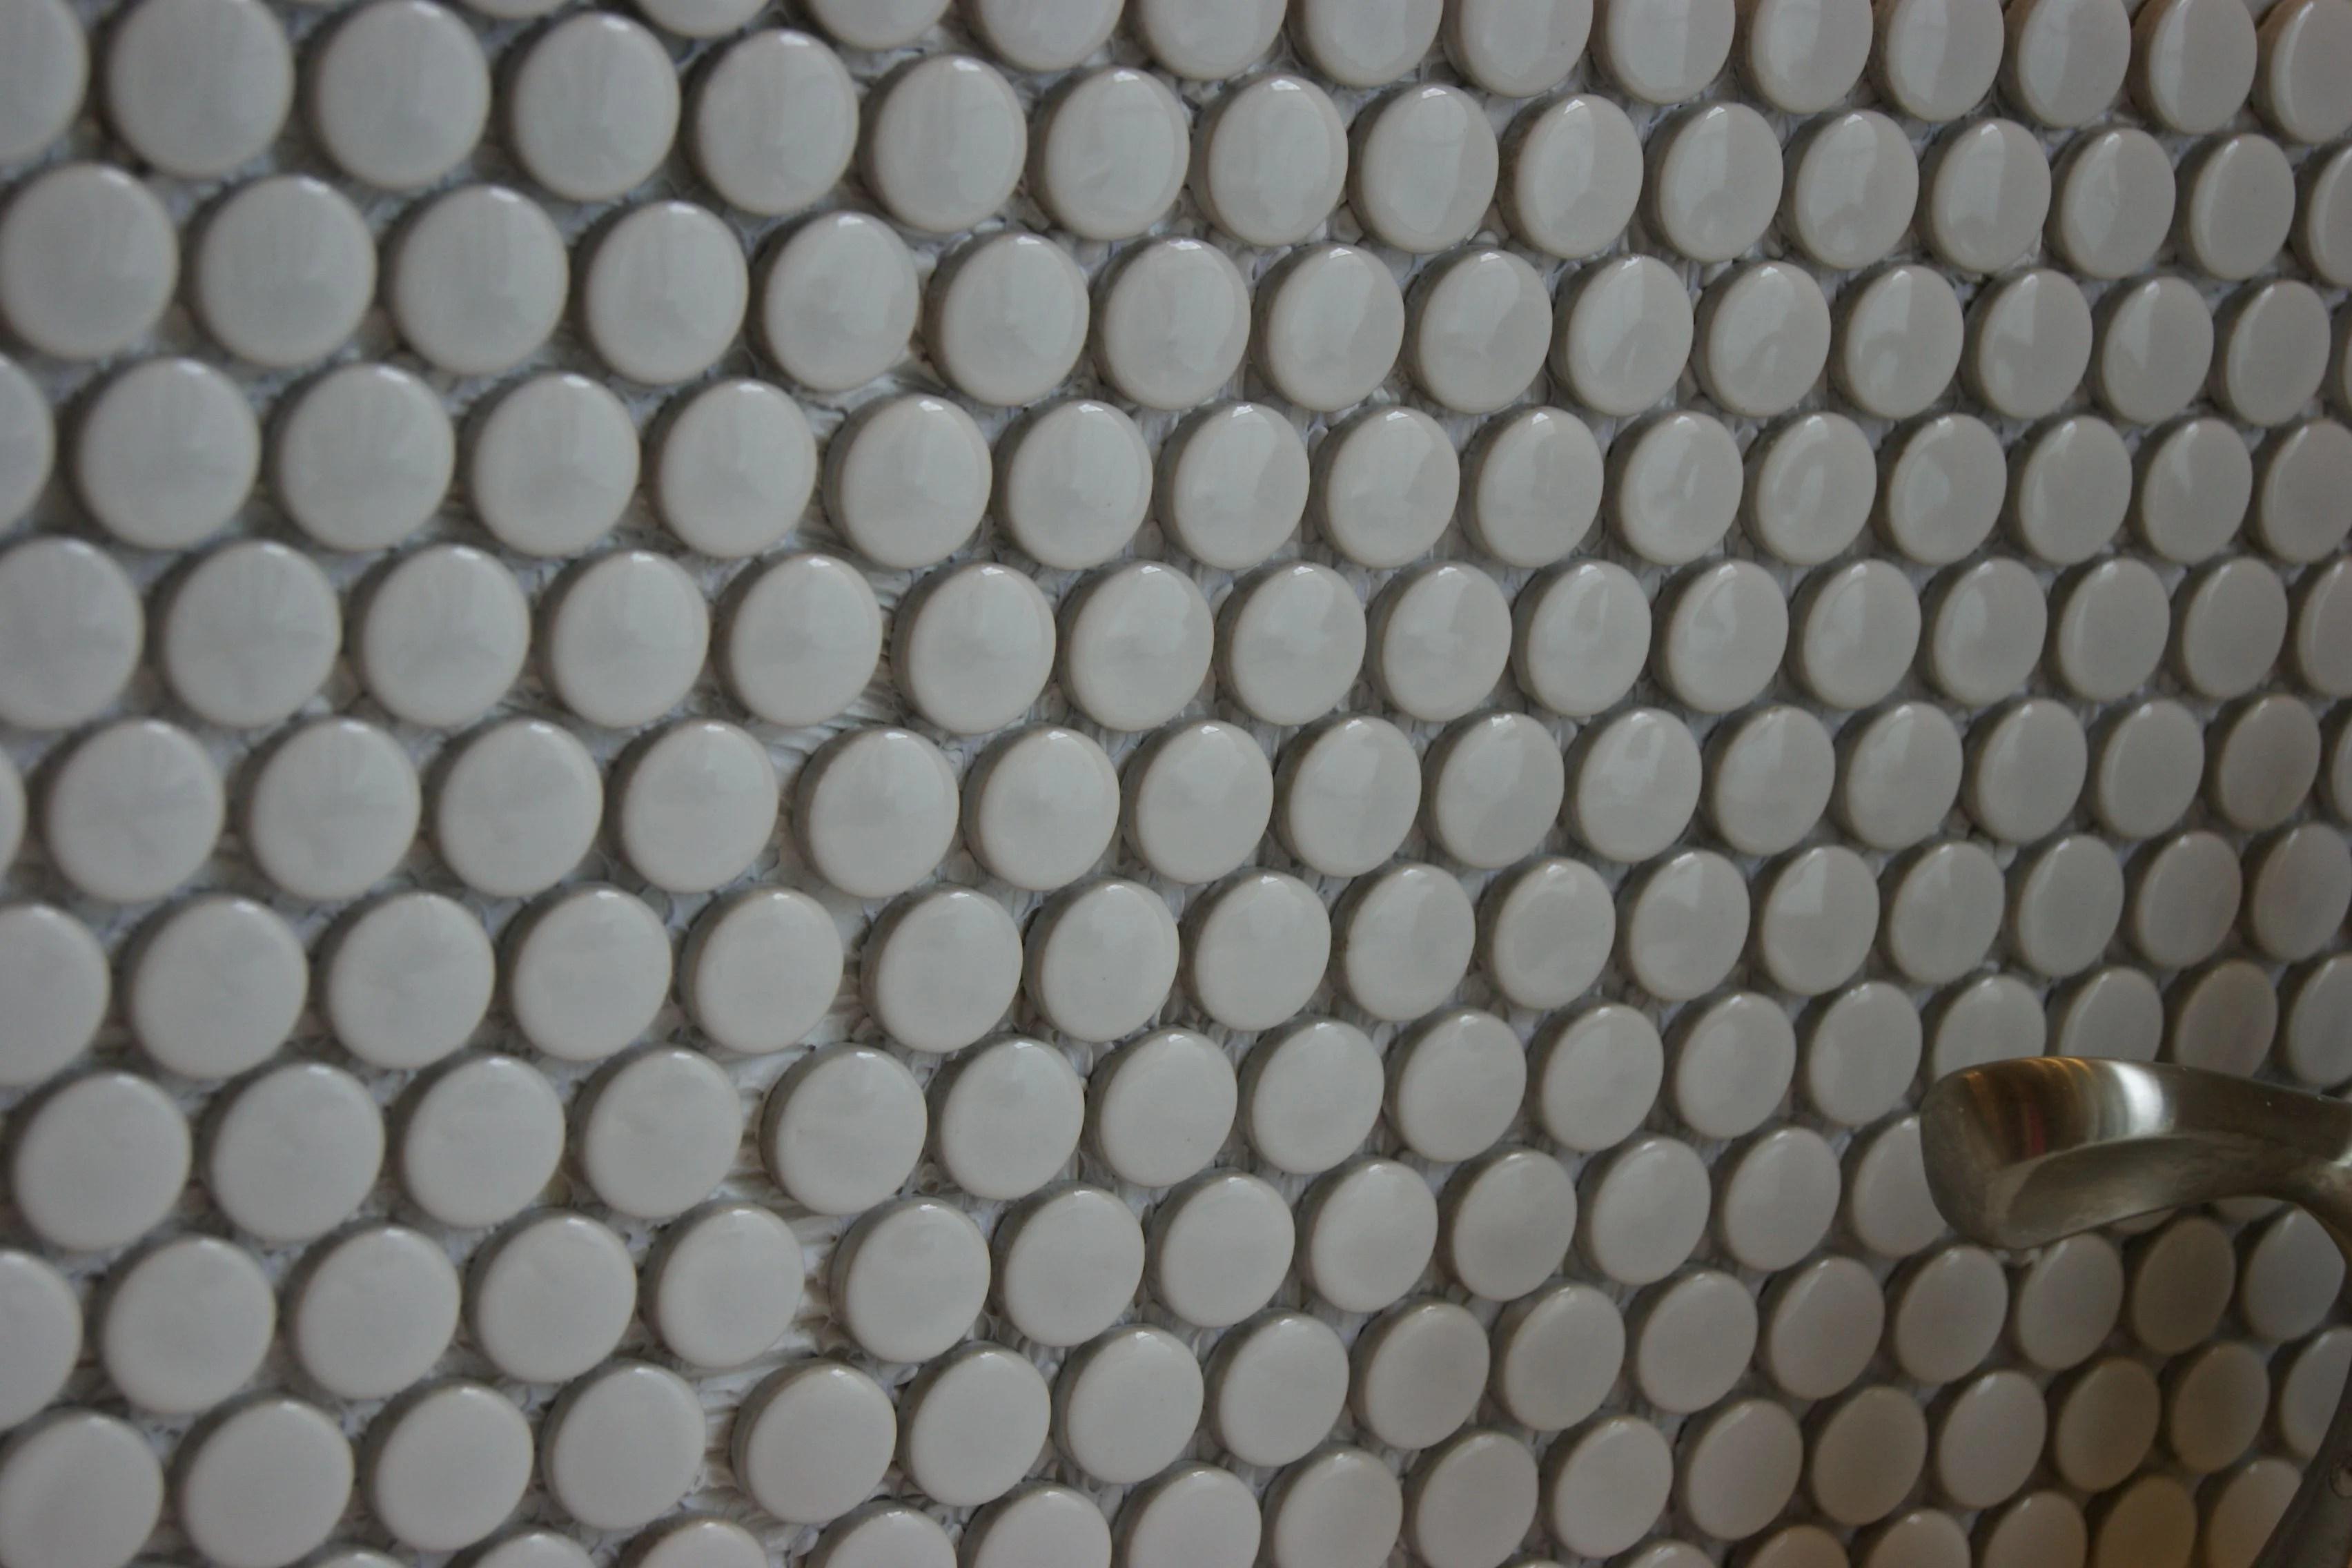 How To Install A Penny Tile Backsplash